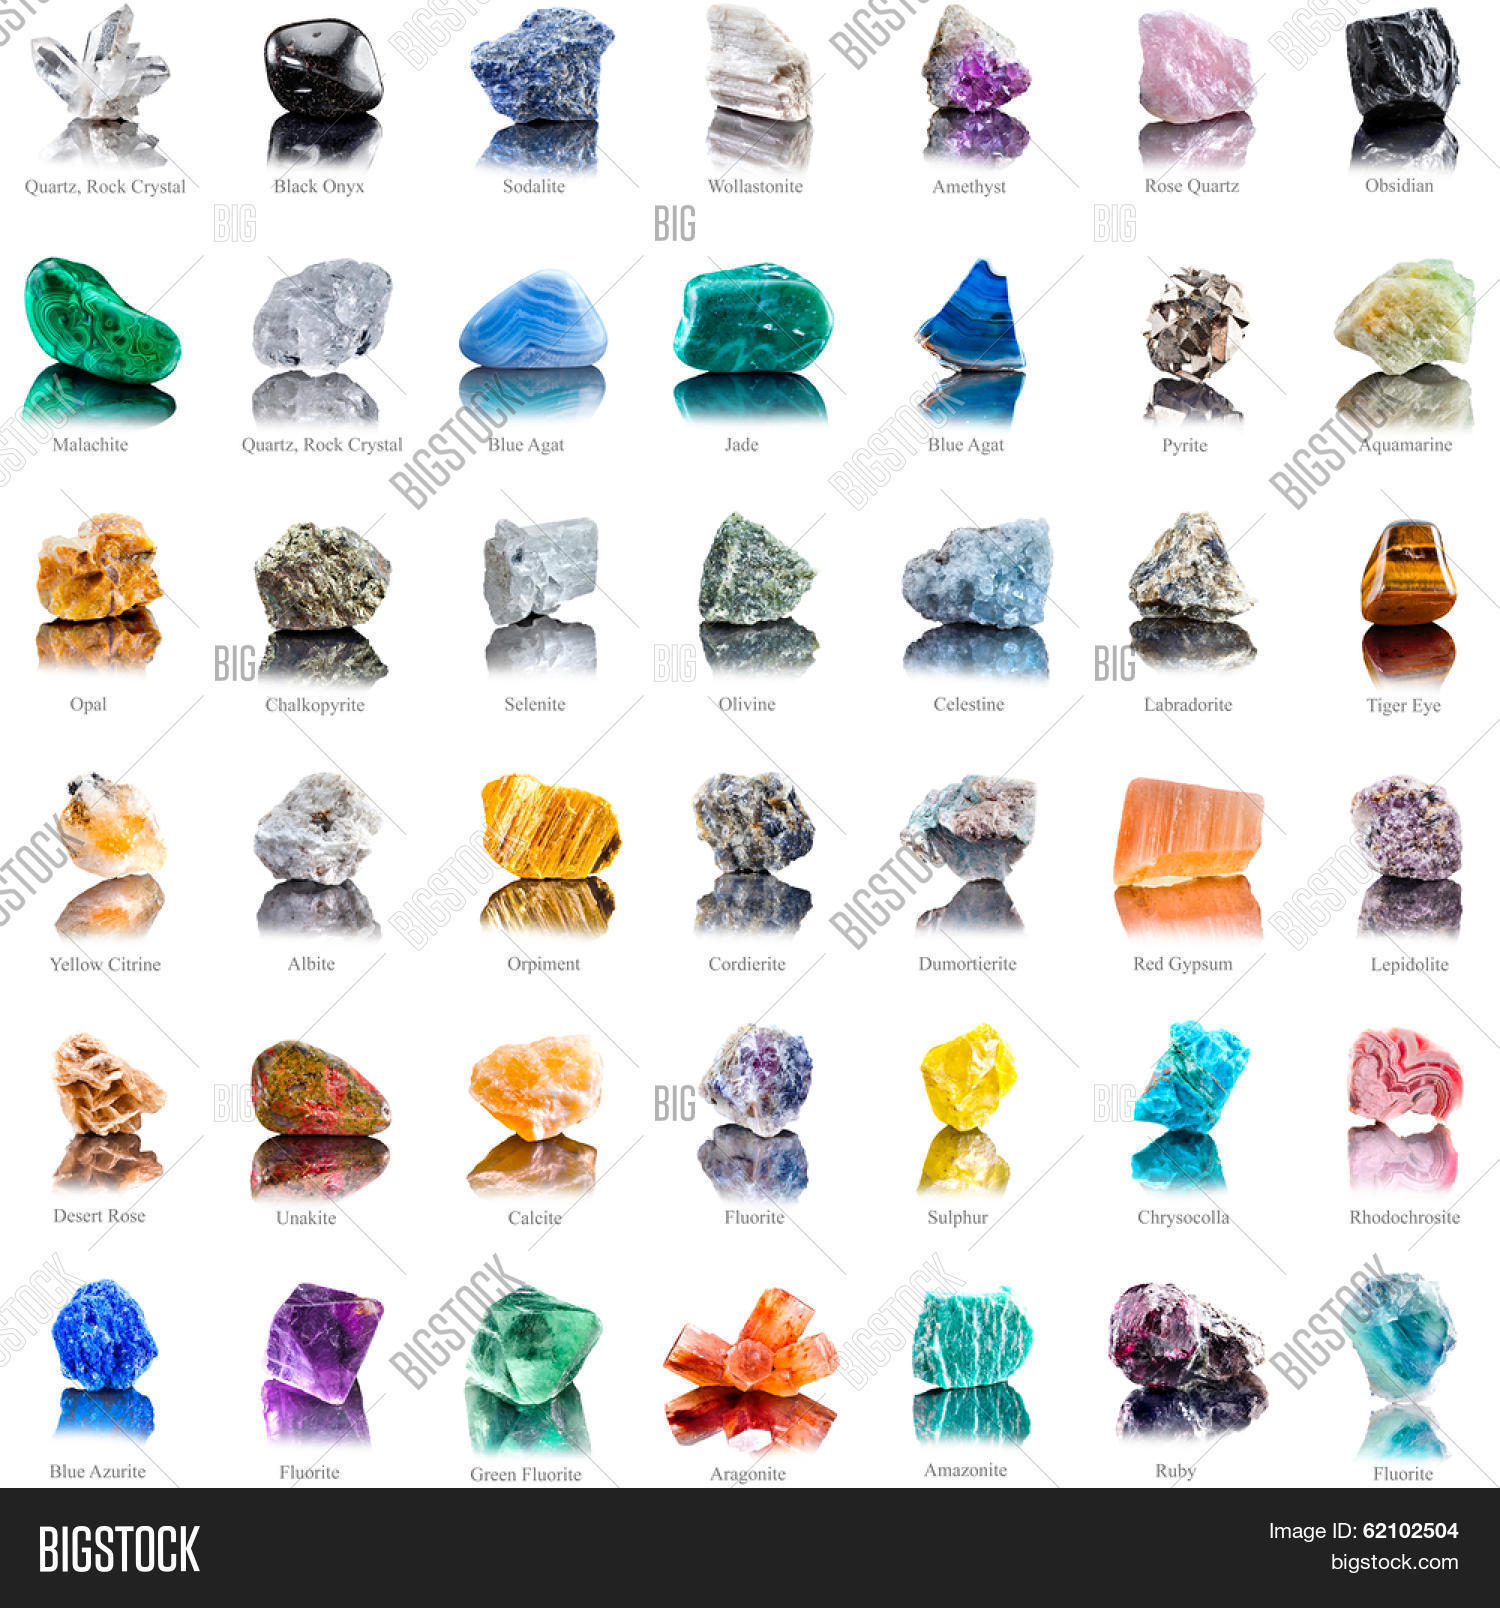 Gemstones Names In Urdu With Pictures - Dropssol.com | 1500 x 1608 jpeg 322kB